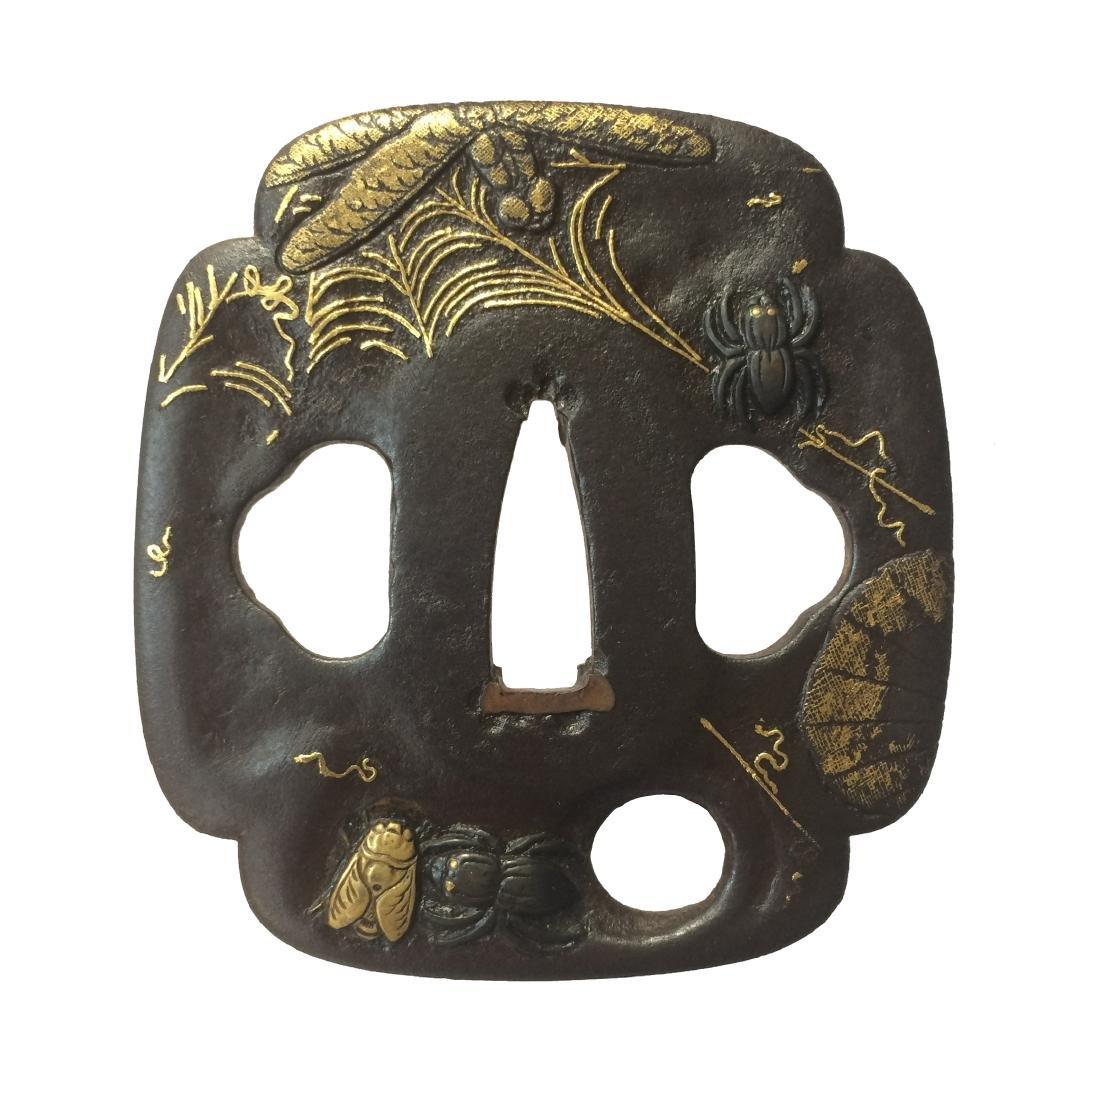 Kumagai (Edo-Higo) tsuba of iron with shakudo and gold